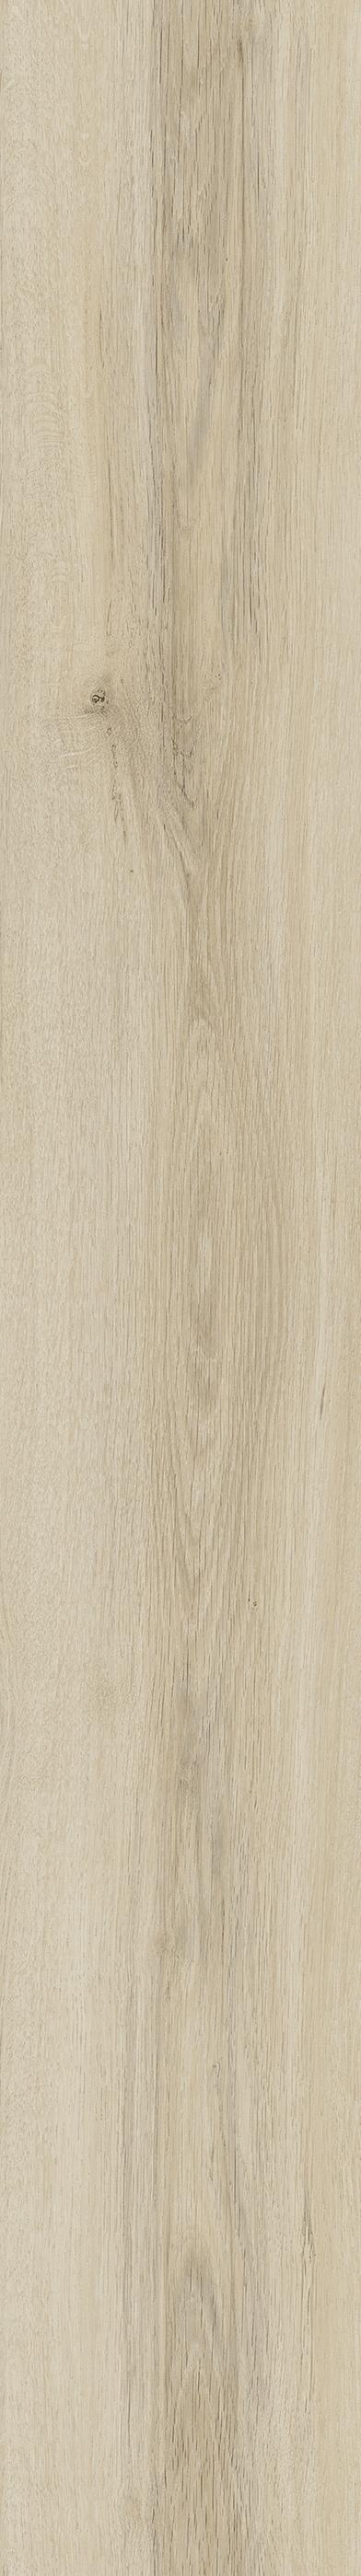 kronotex dynamic plus laminat eiche arles d 4702 von. Black Bedroom Furniture Sets. Home Design Ideas